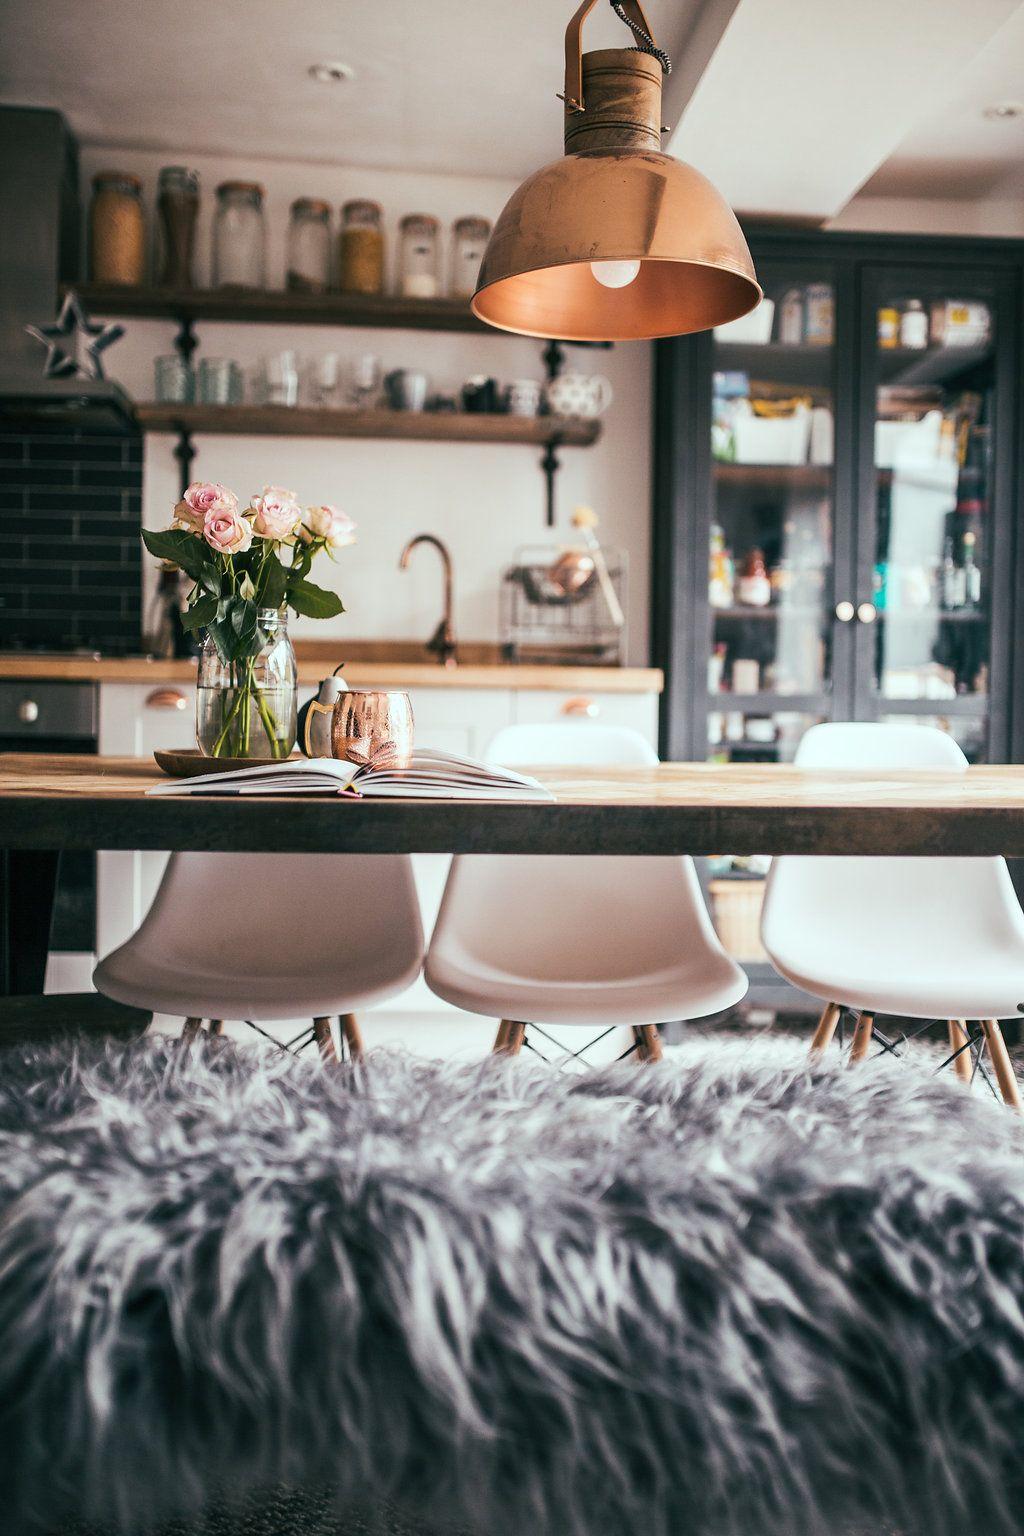 copper pendant lights   Interior design blogs, Innenarchitektur